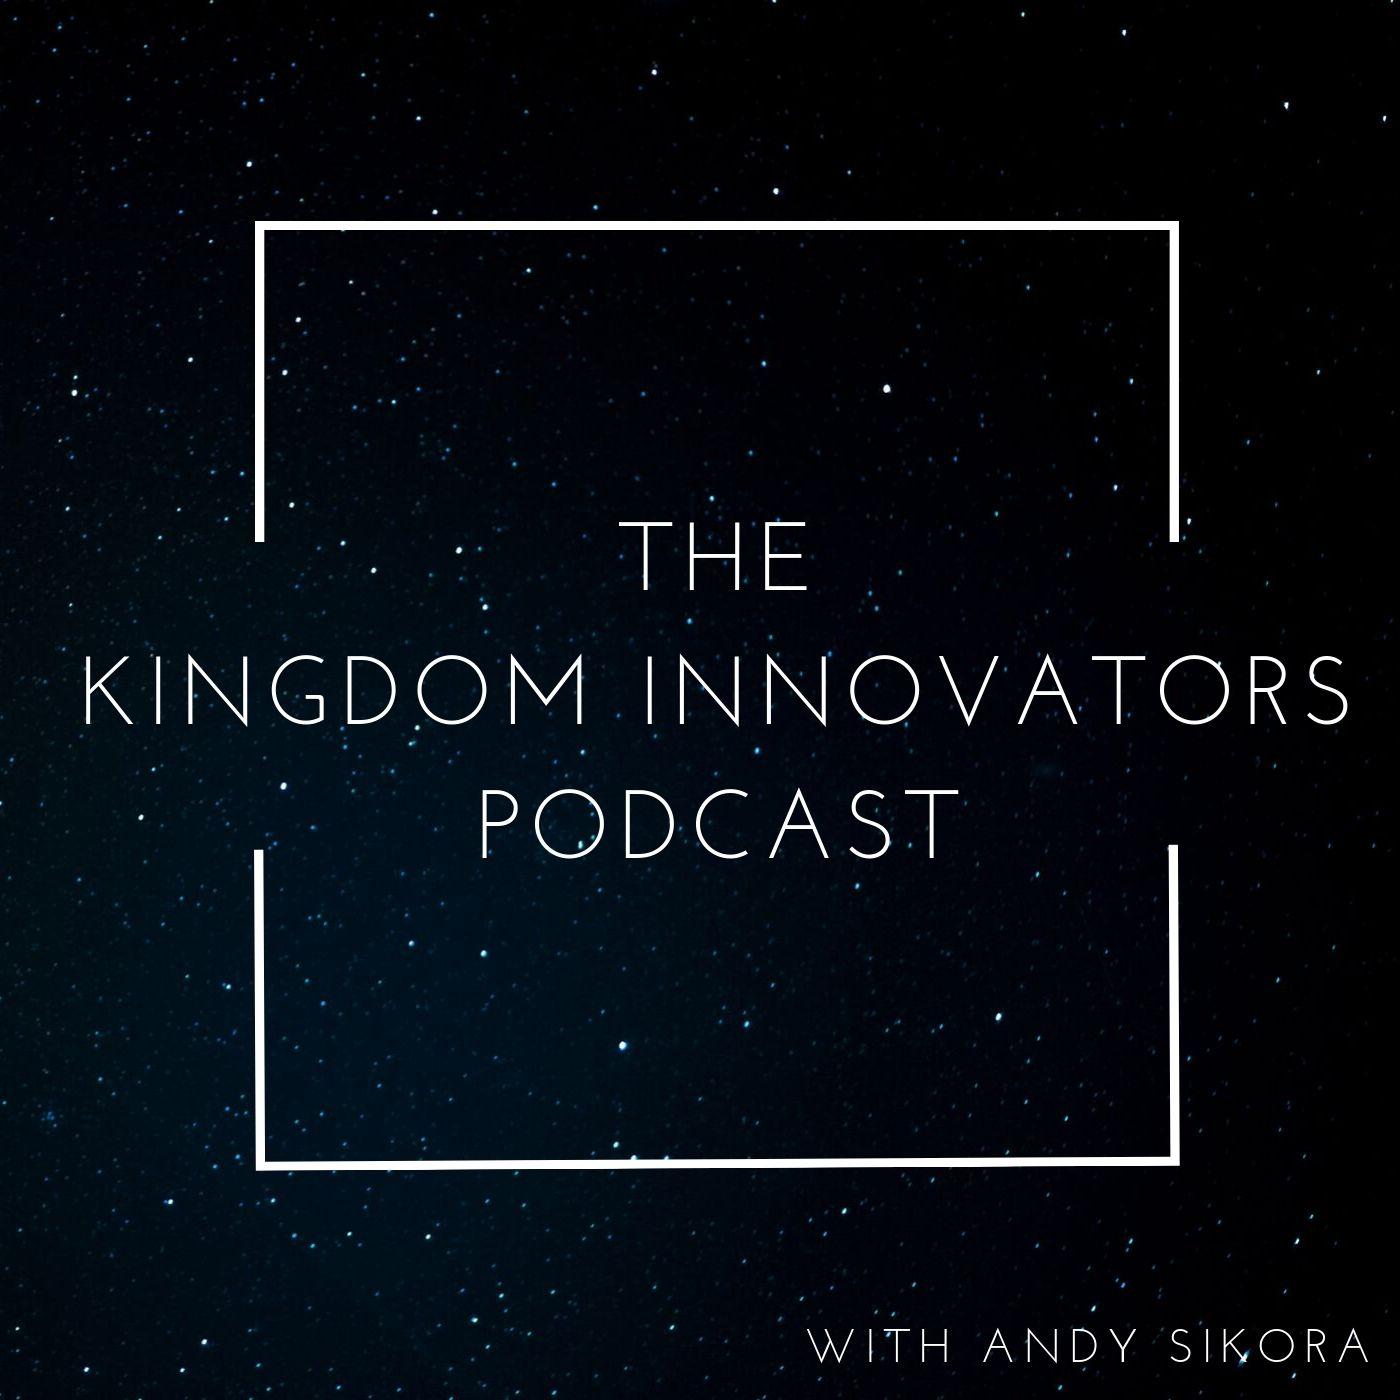 The Kingdom Innovators Podcast show art